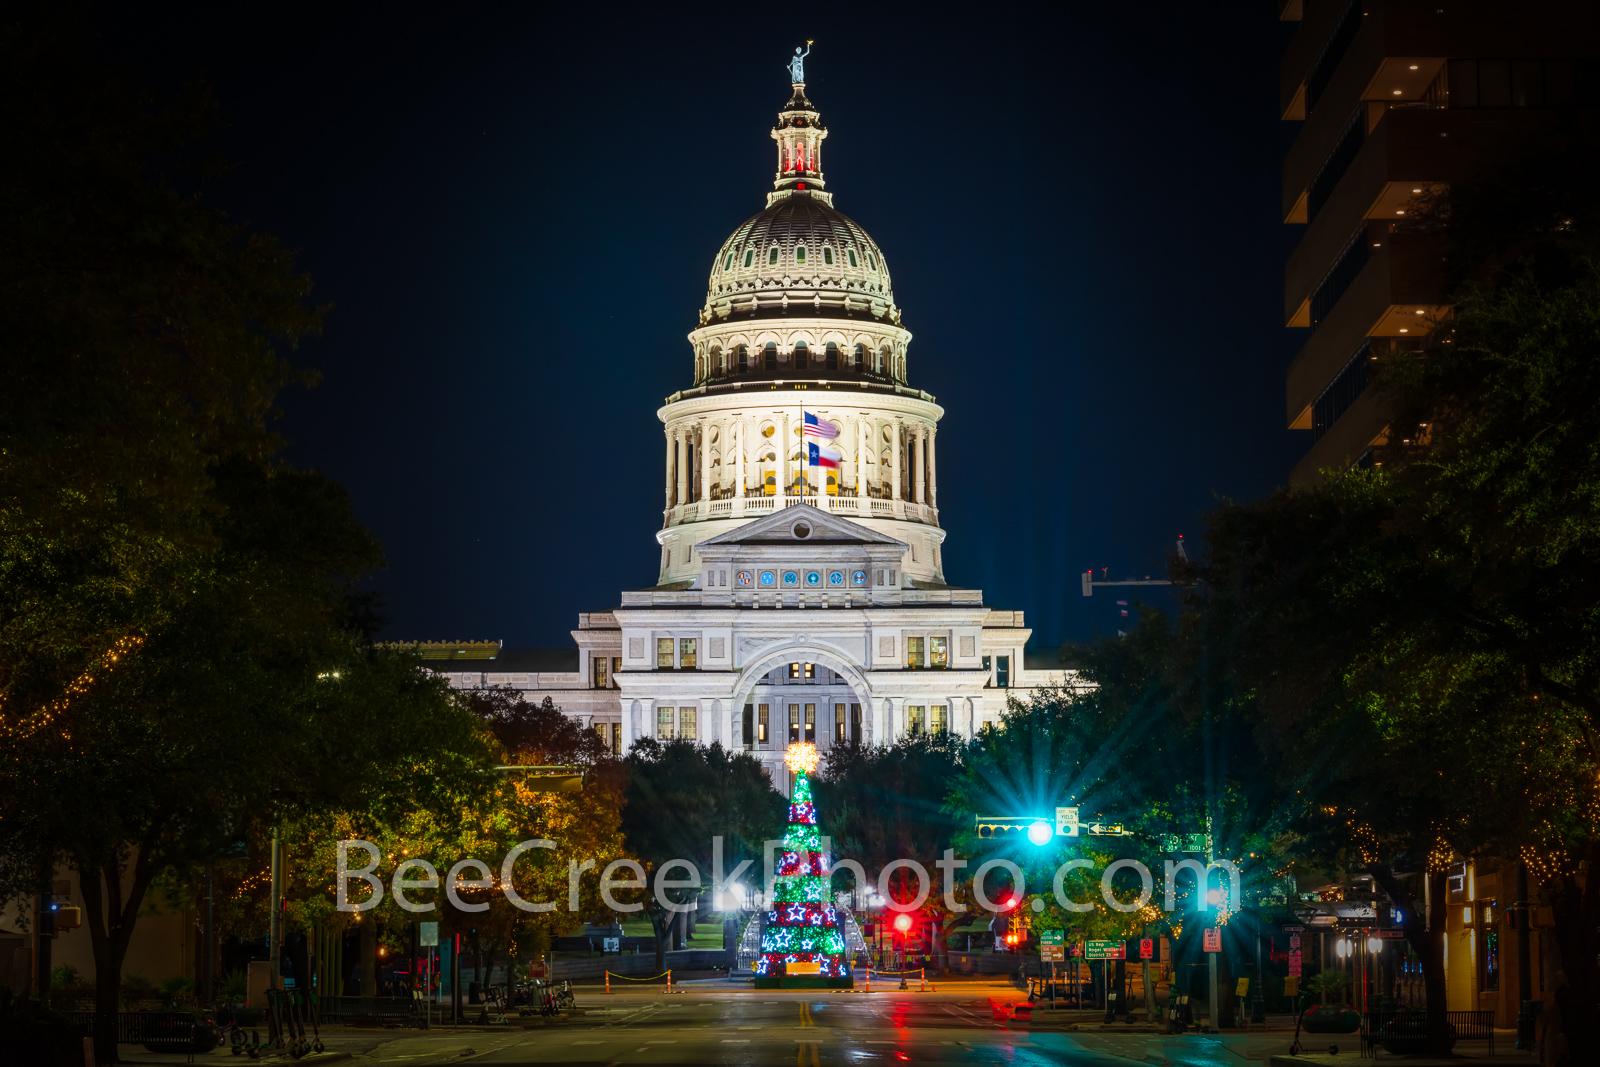 austin, capitol, texas capitol, capital, chistmas tree, christmas, city, downtown, light, holiday, congress ave, austin texas, downtown austin, city of austin, , photo